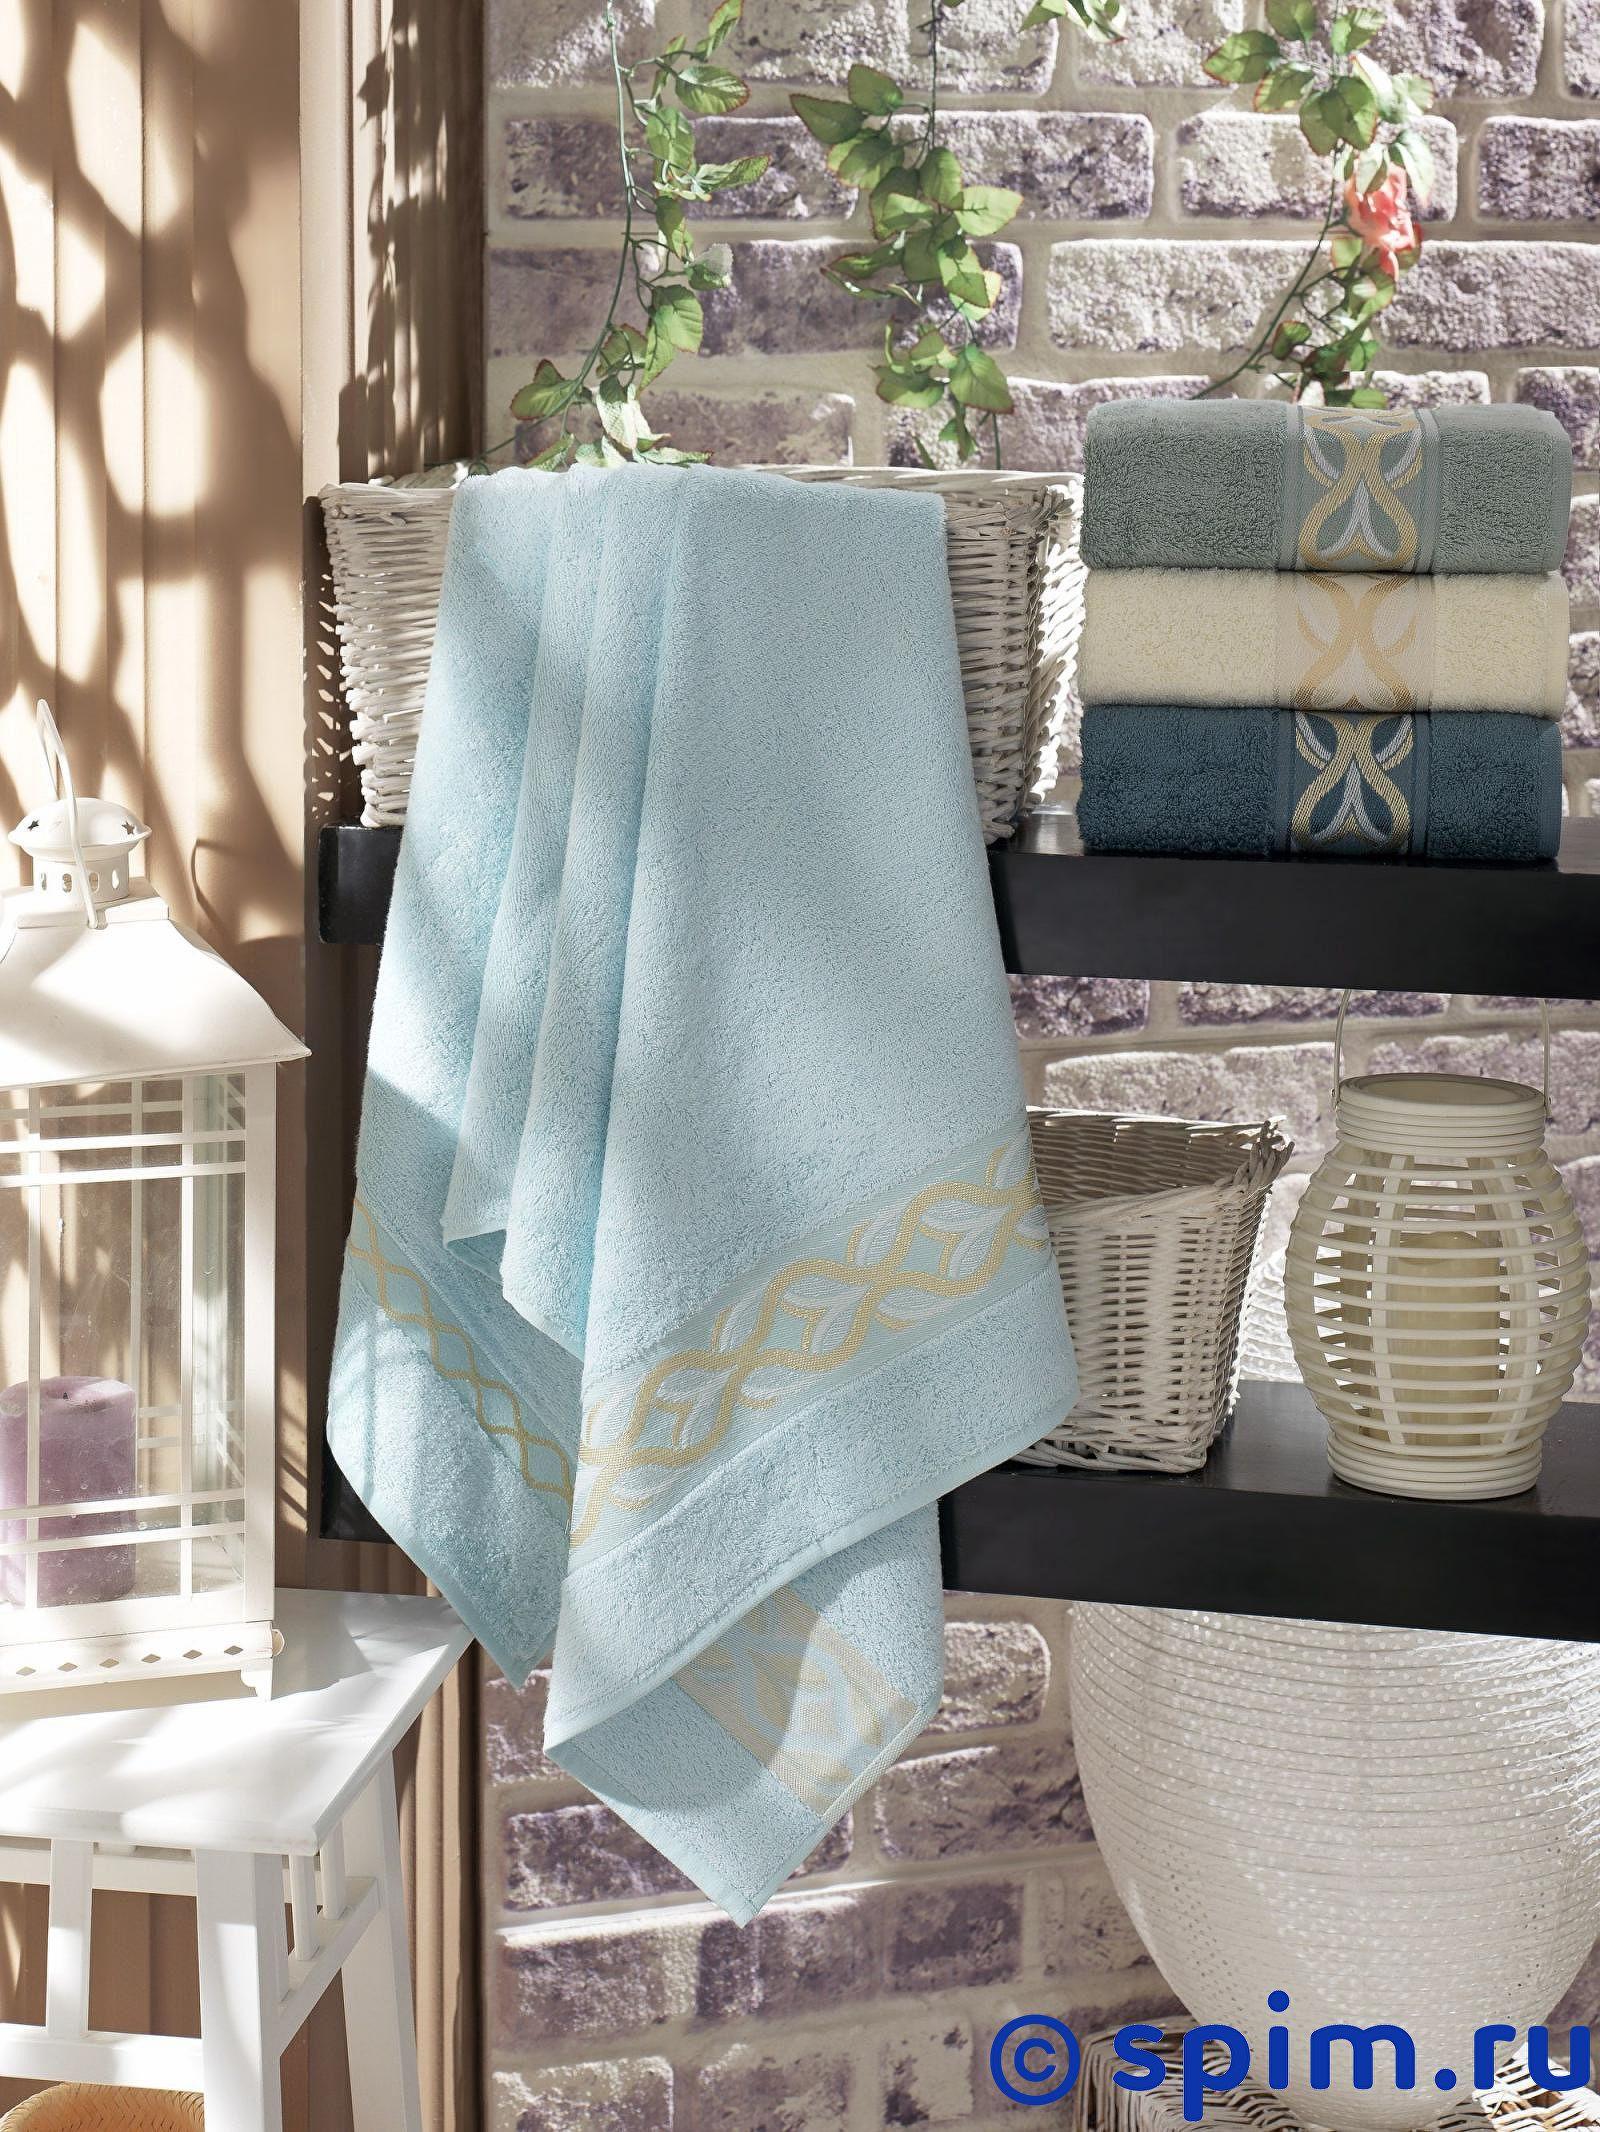 Набор из 4-х полотенец Do&co Lilium 70х140 см полотенца do n co полотенце lady цвет мятный набор